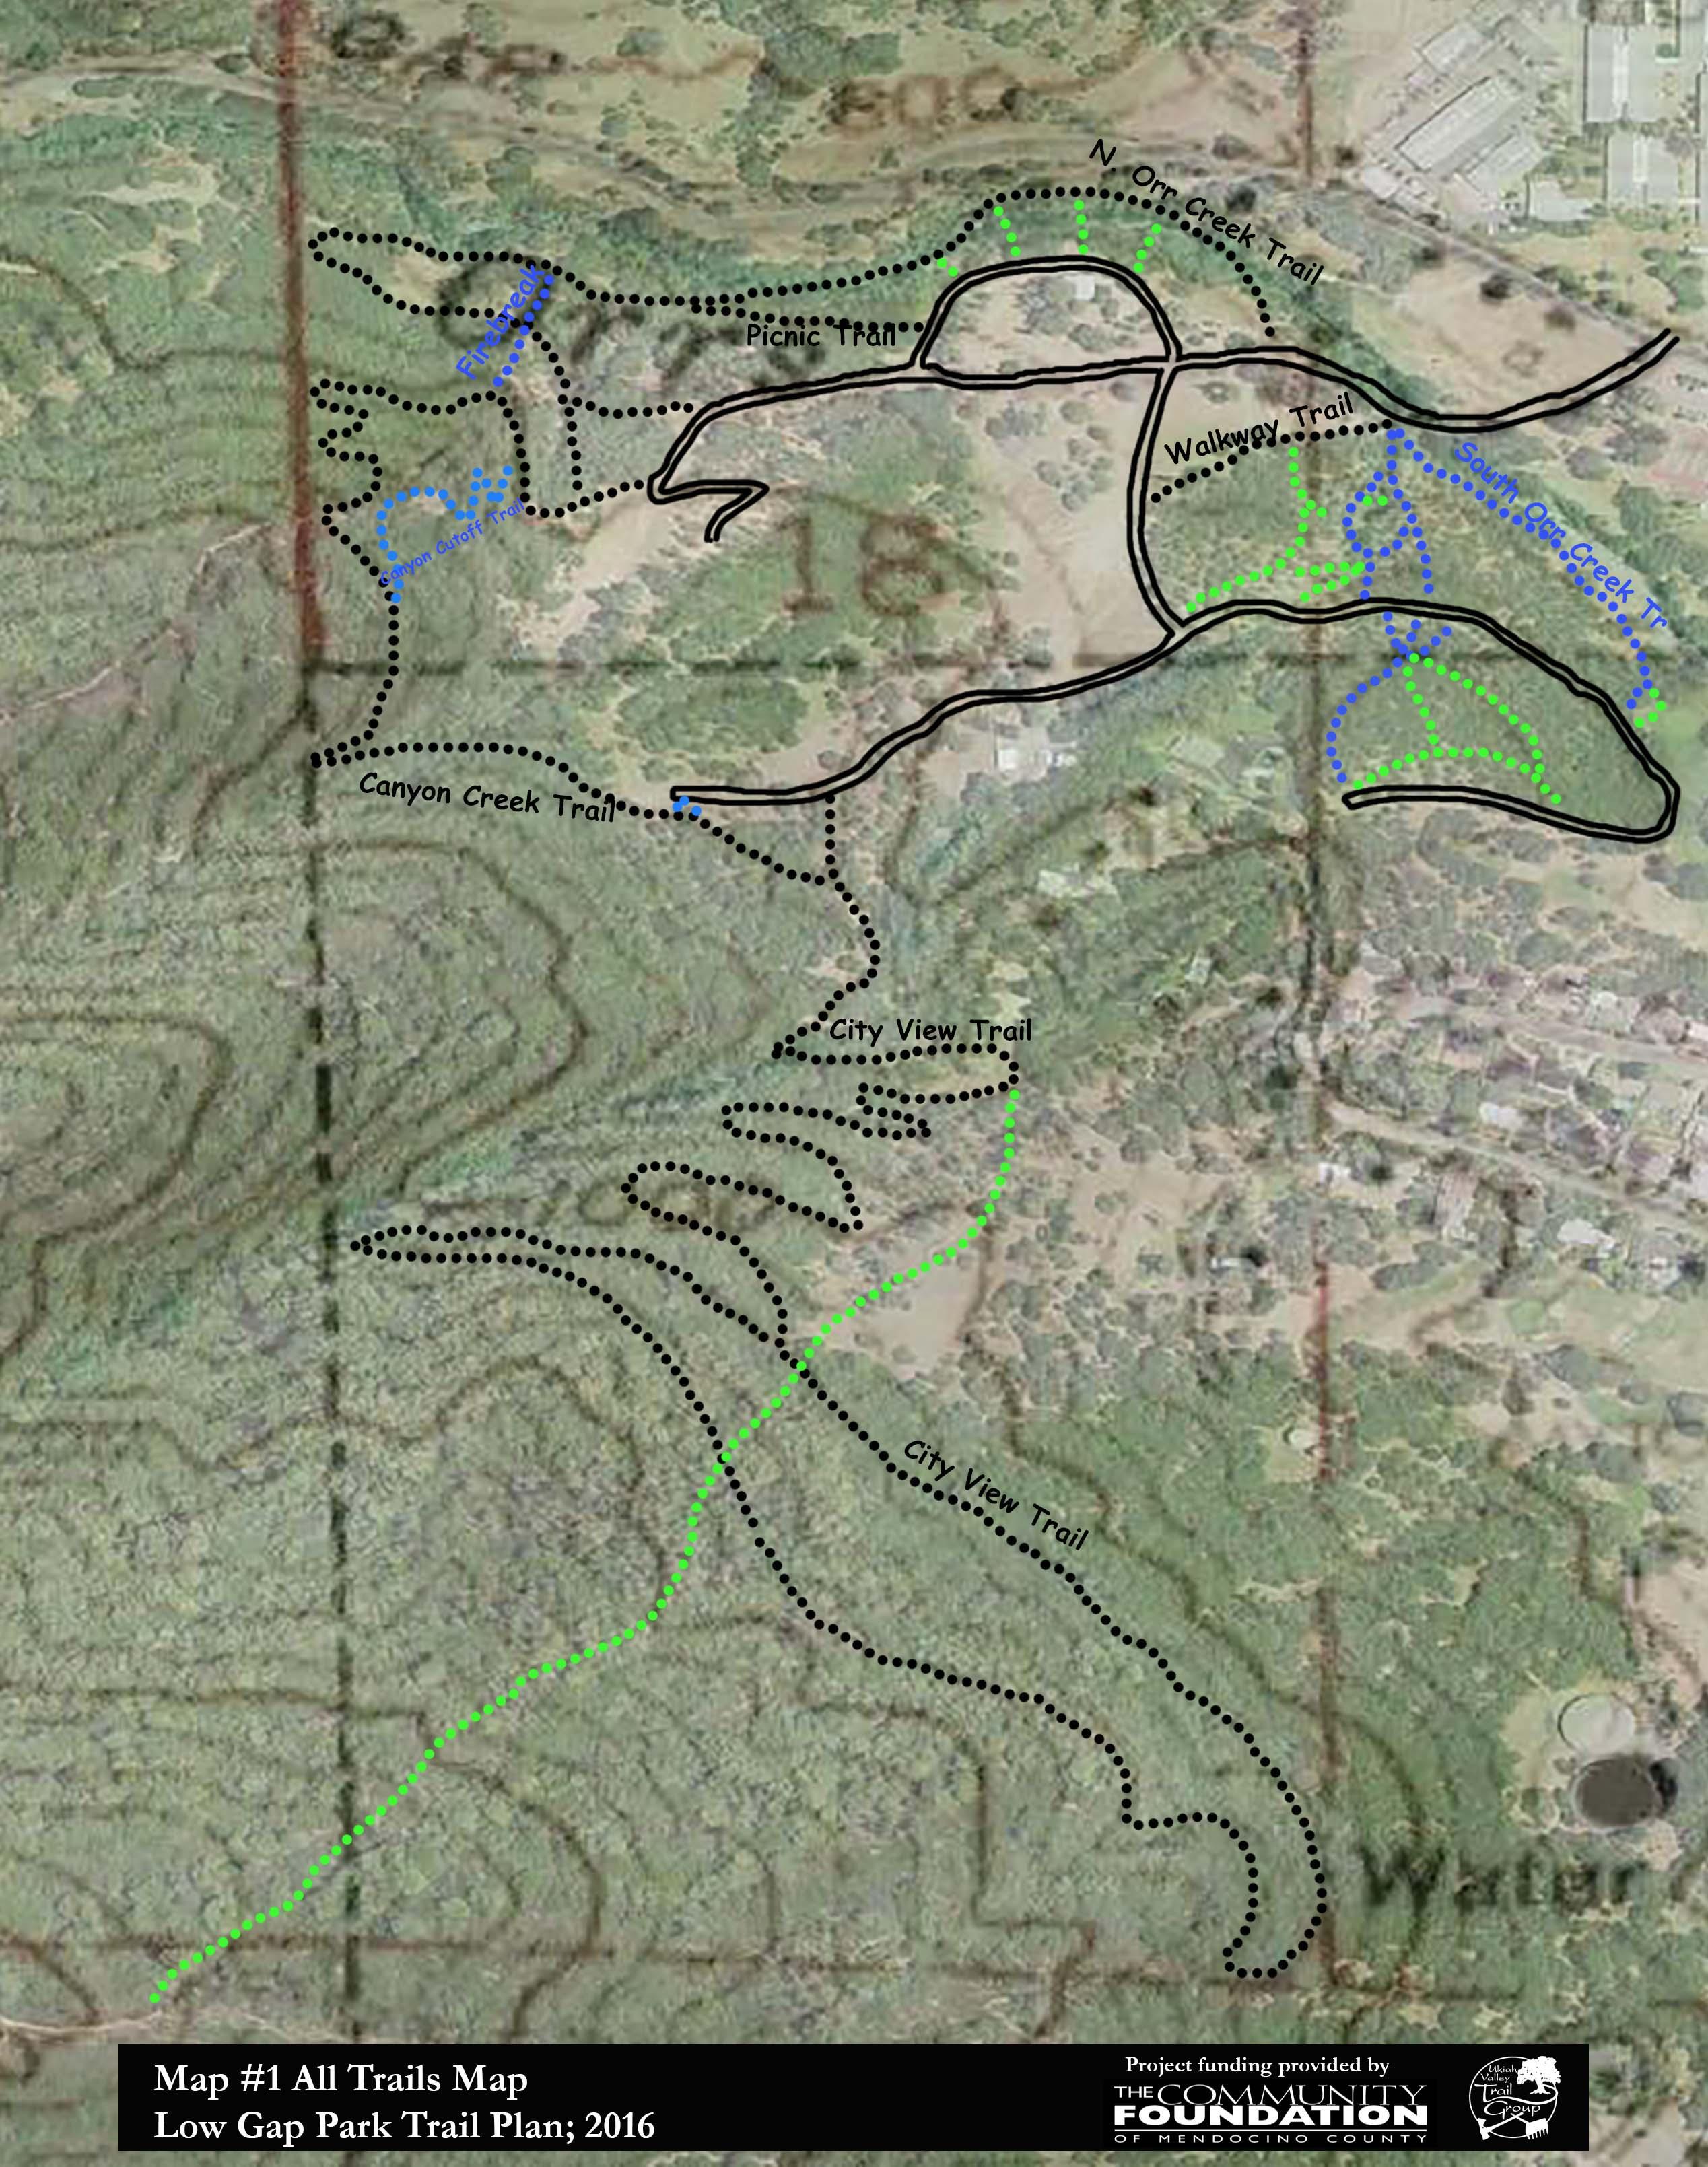 Low Gap Park Trails   Ukiah Valley Trail Group High Bridge Trail Map on